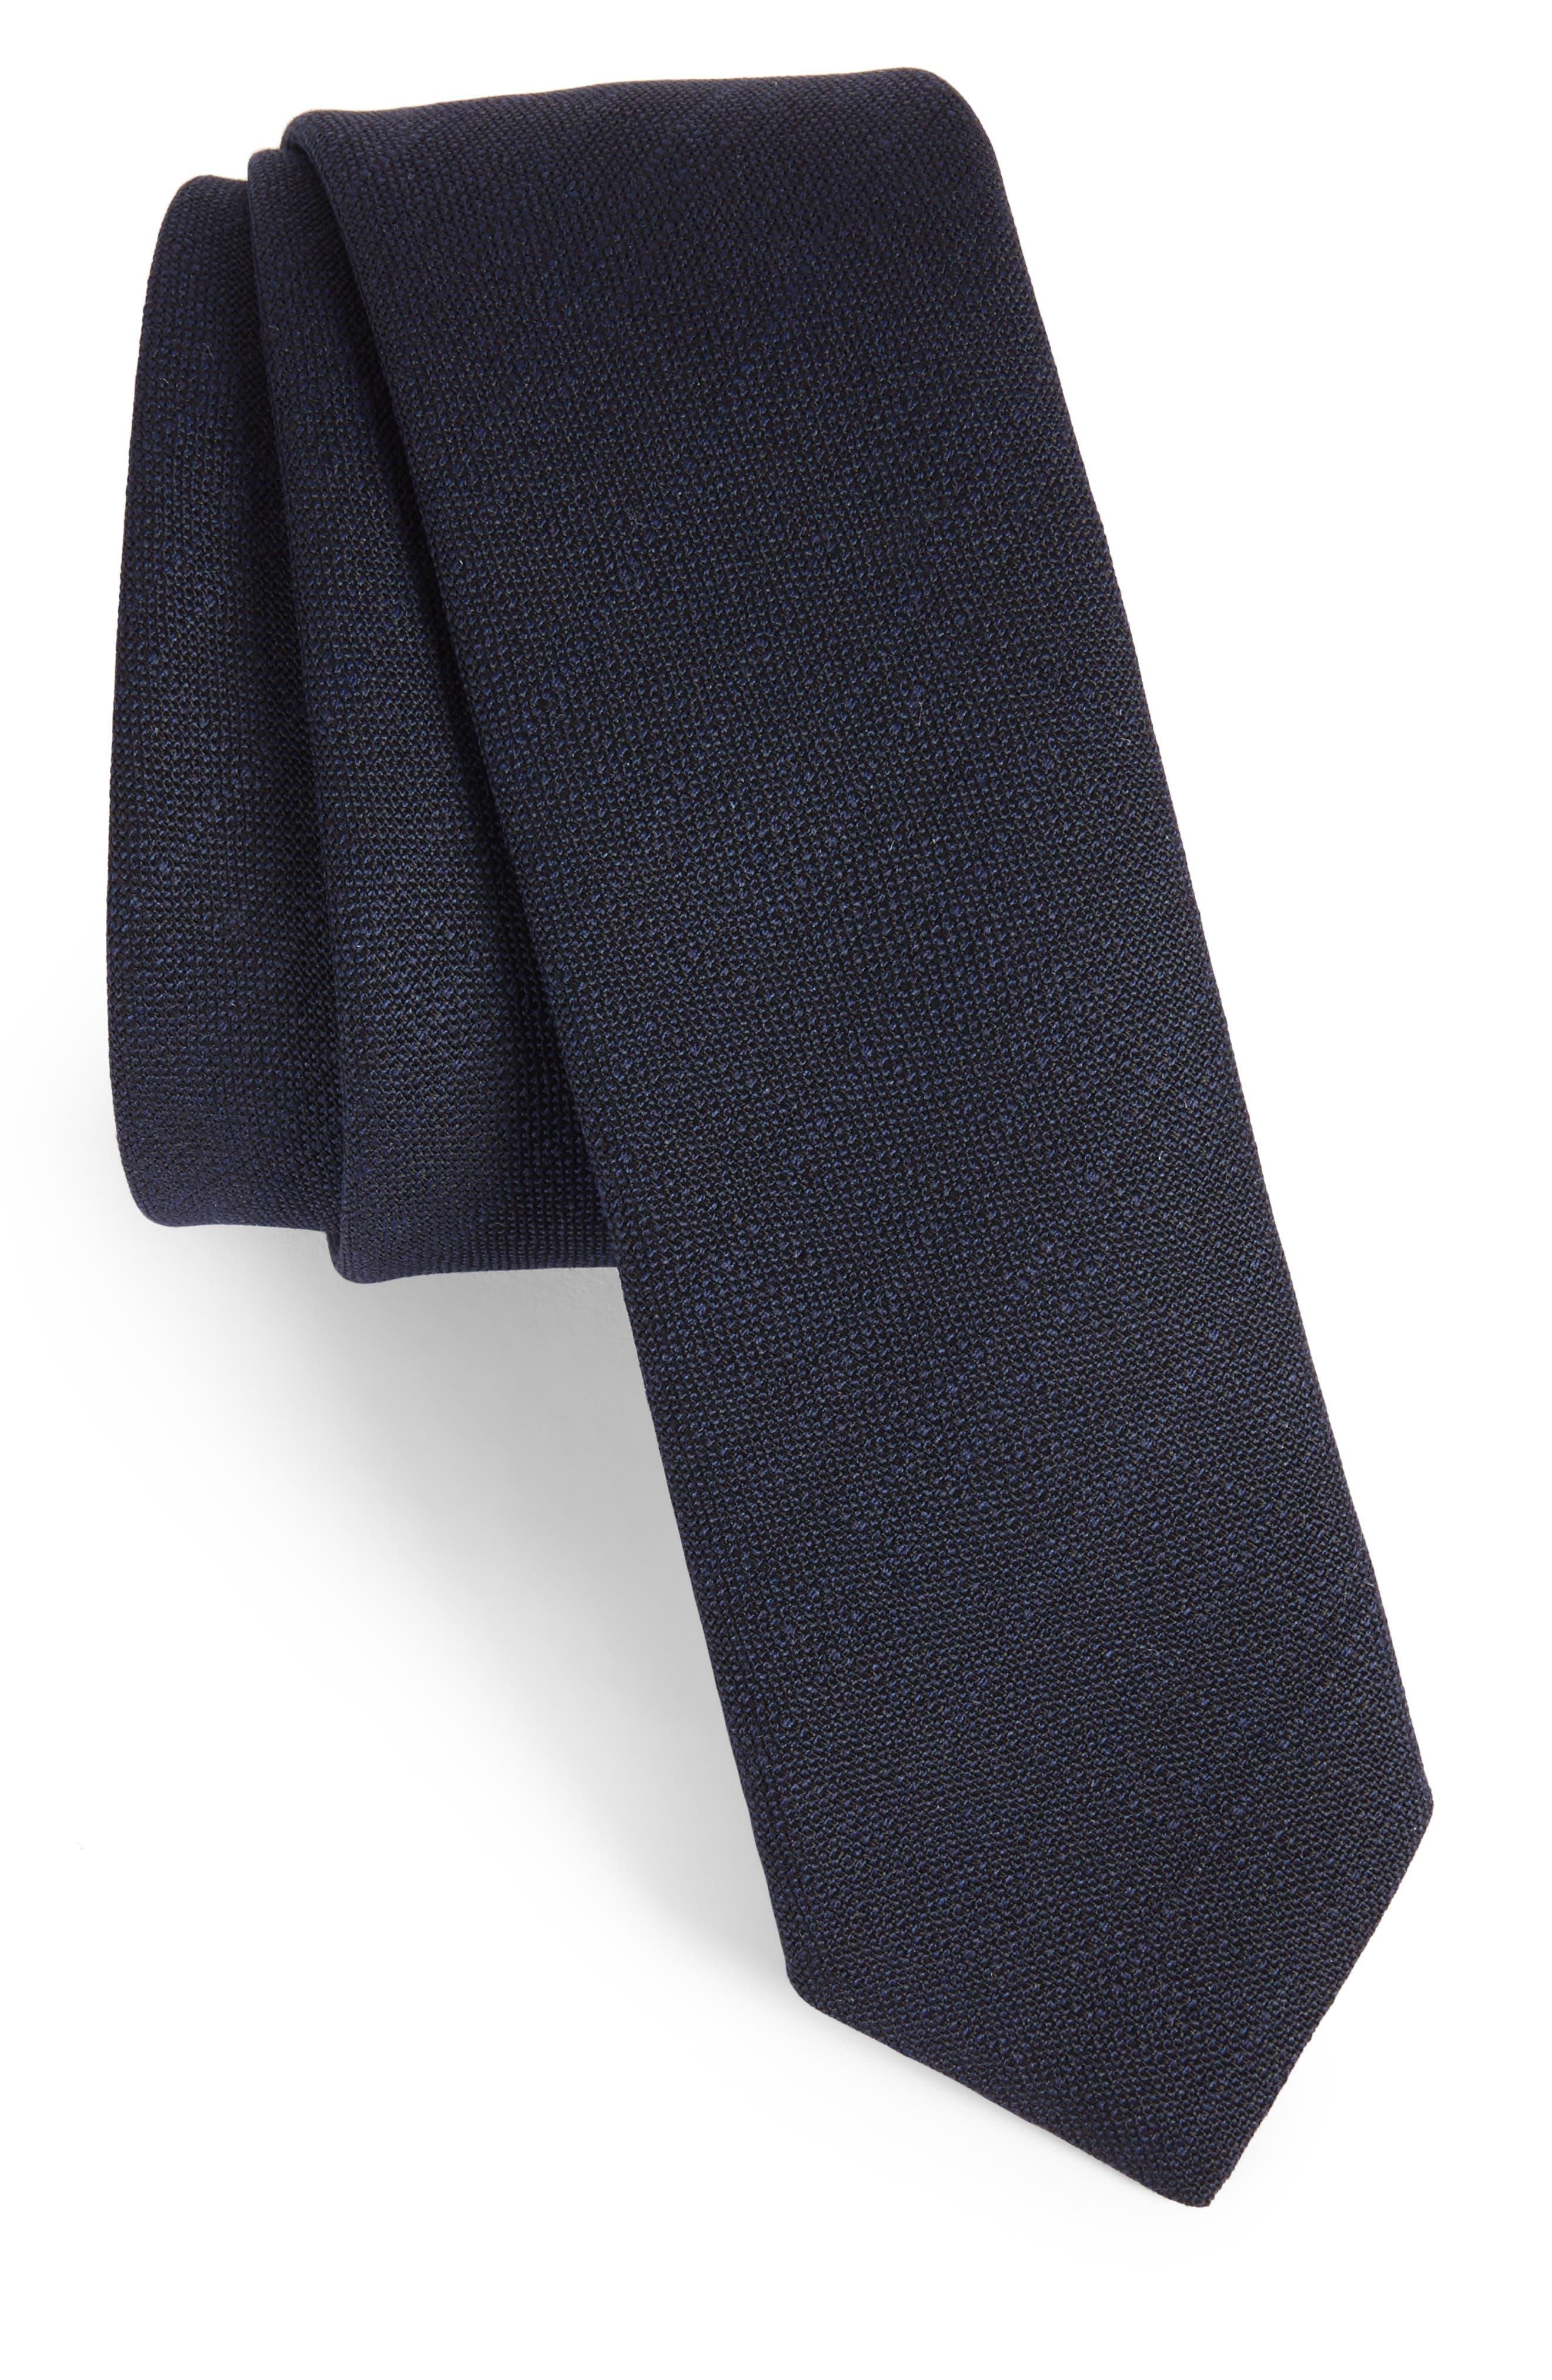 Main Image - Eleventy Jaspé Wool Skinny Tie